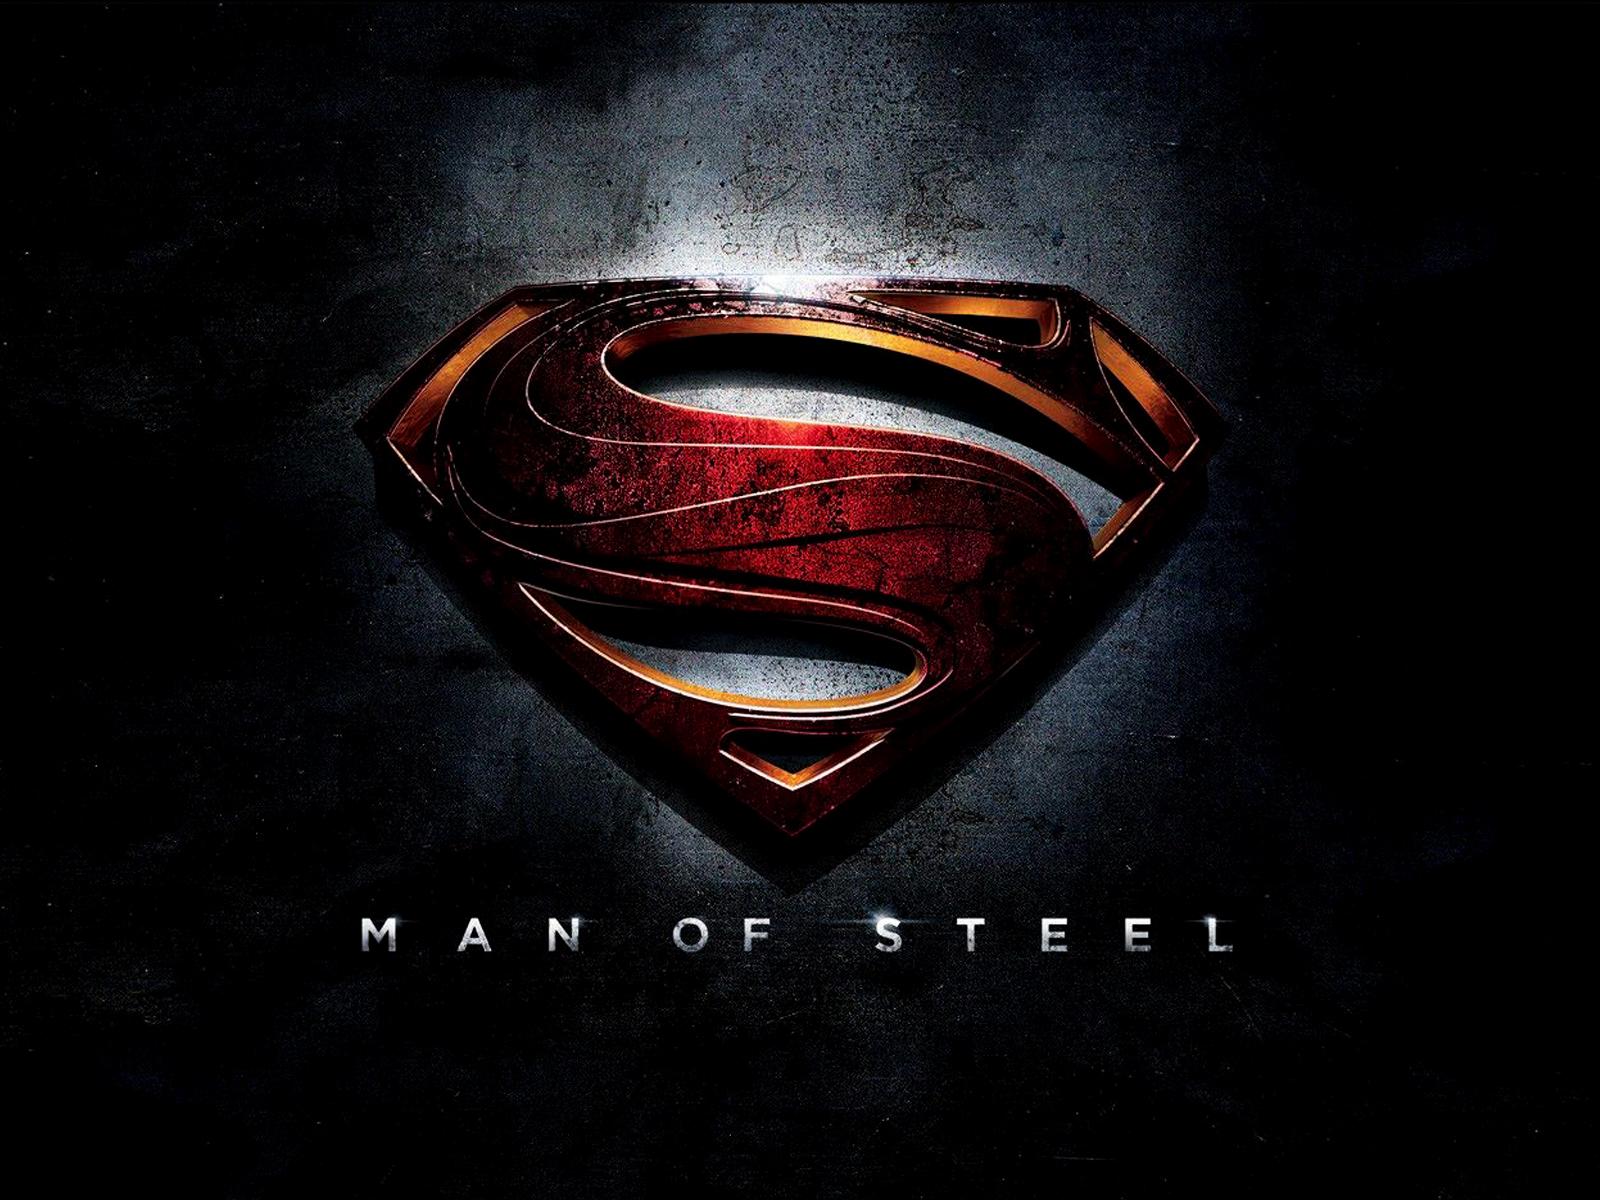 Man of Steel Superman 2013 HD Wallpapers Download Wallpapers in 1600x1200